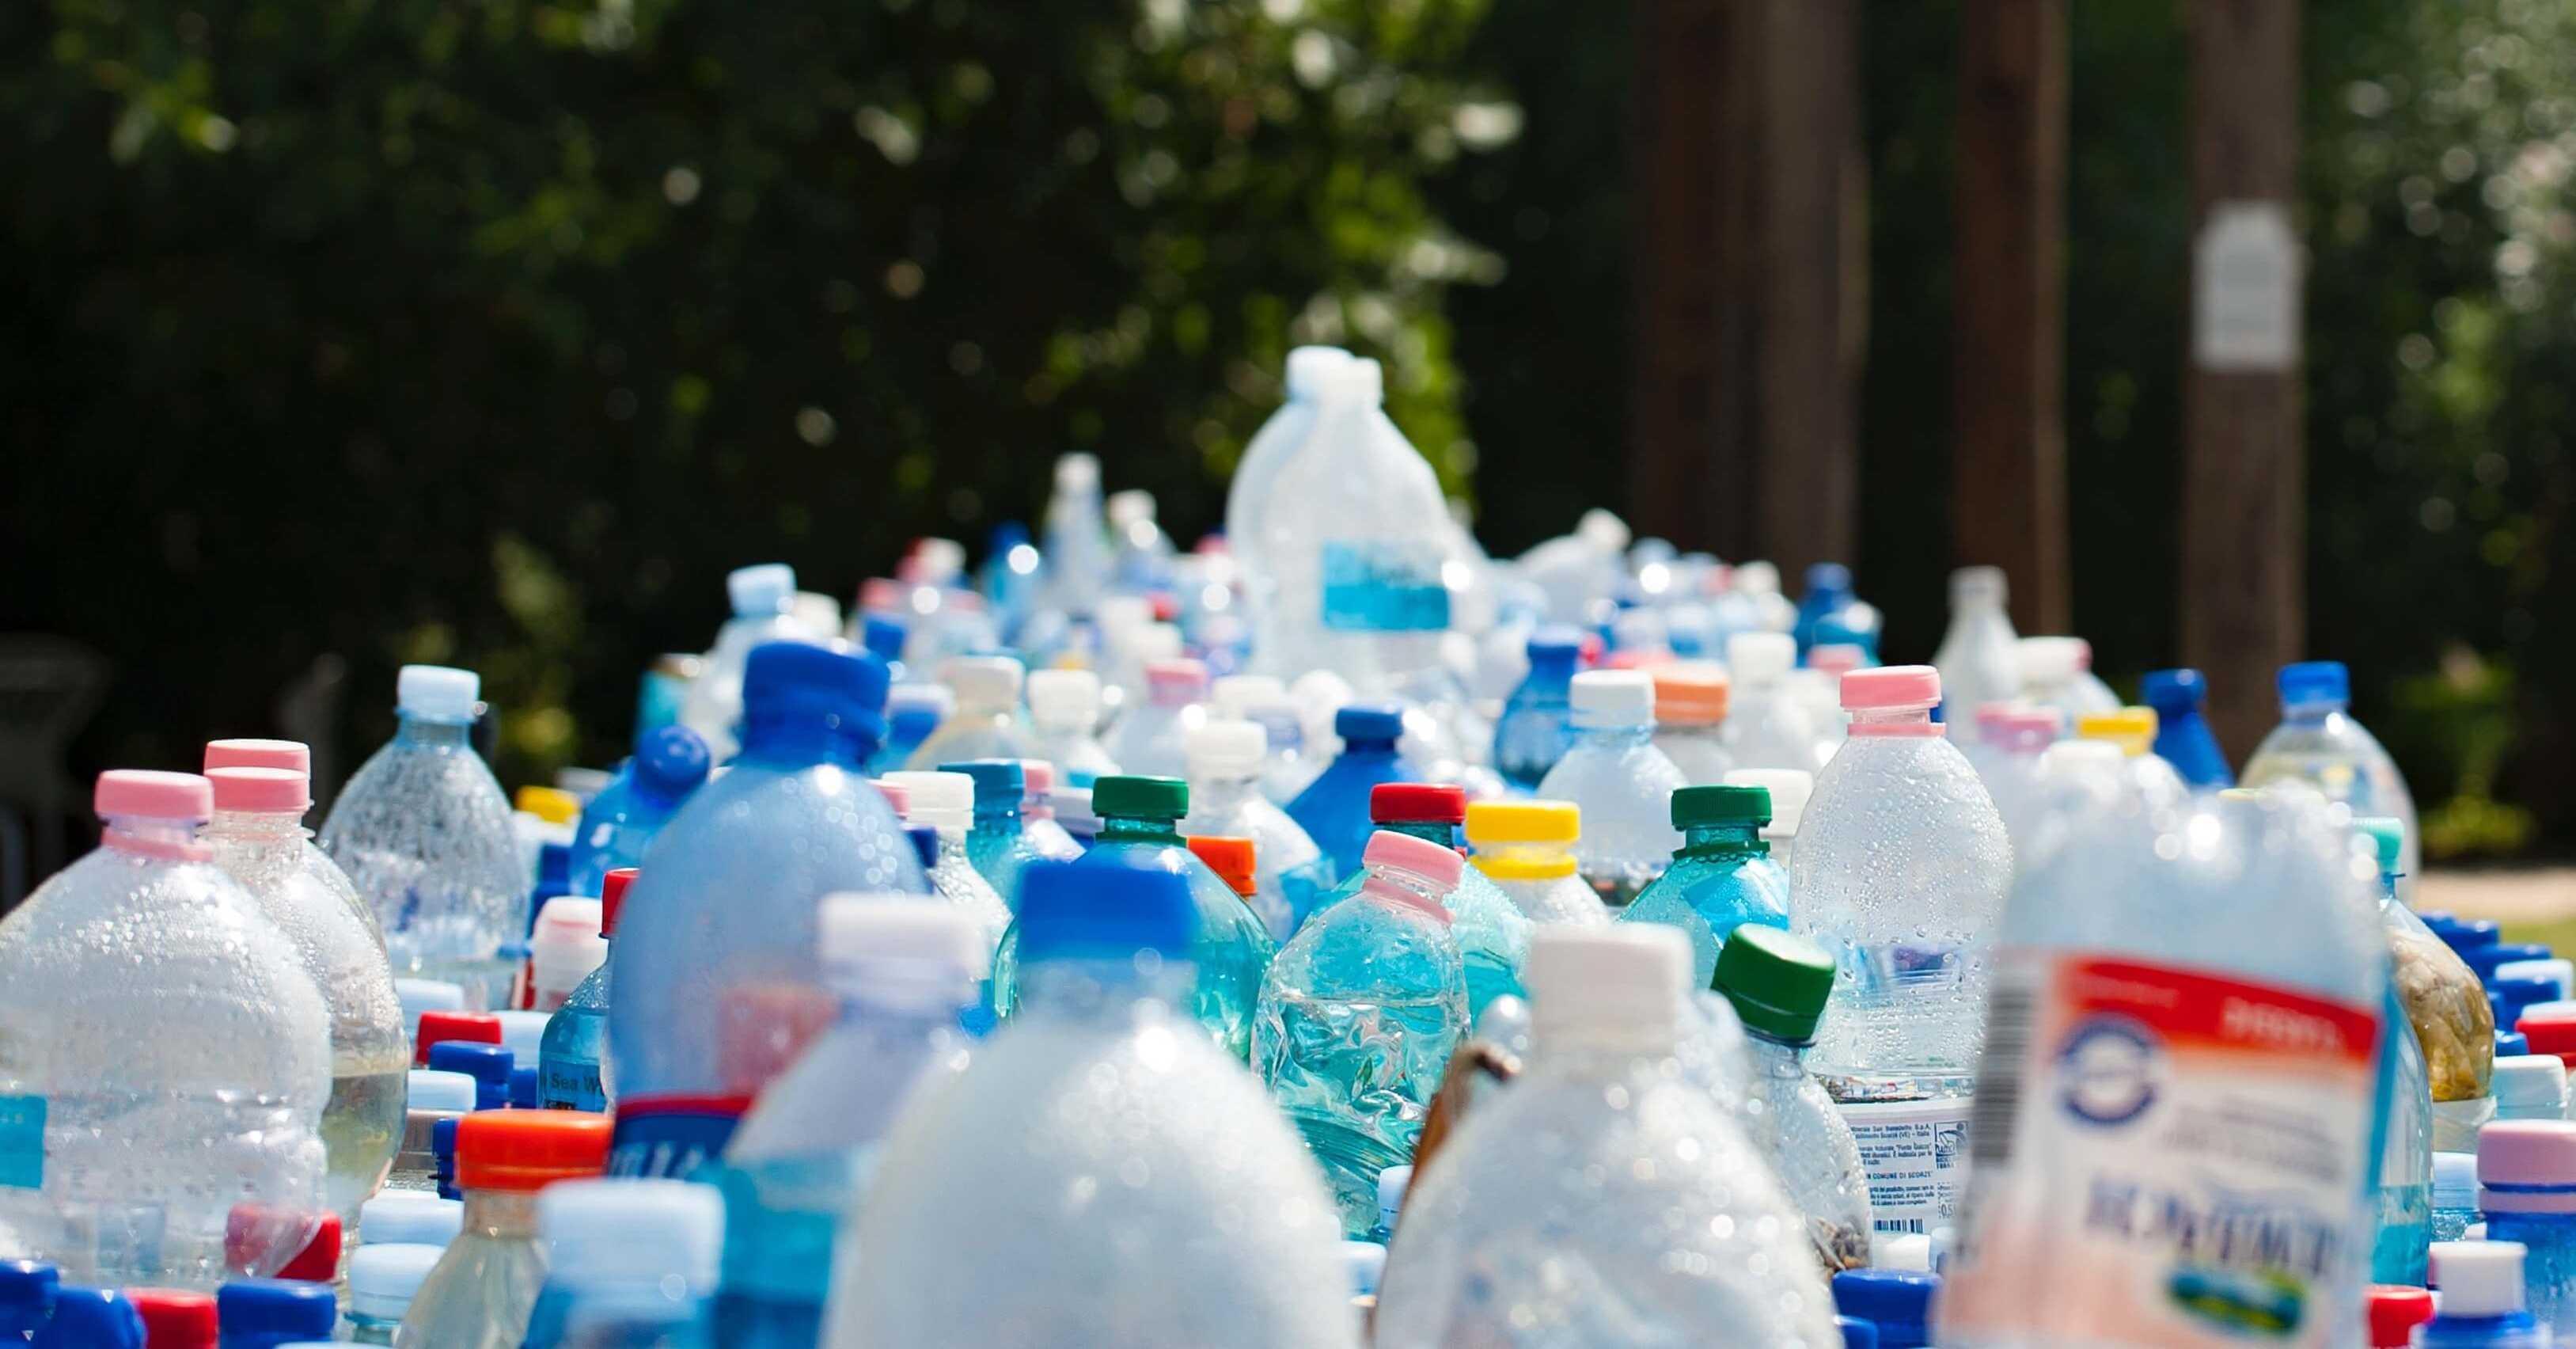 plastic bottle waste reduce maintenance costs